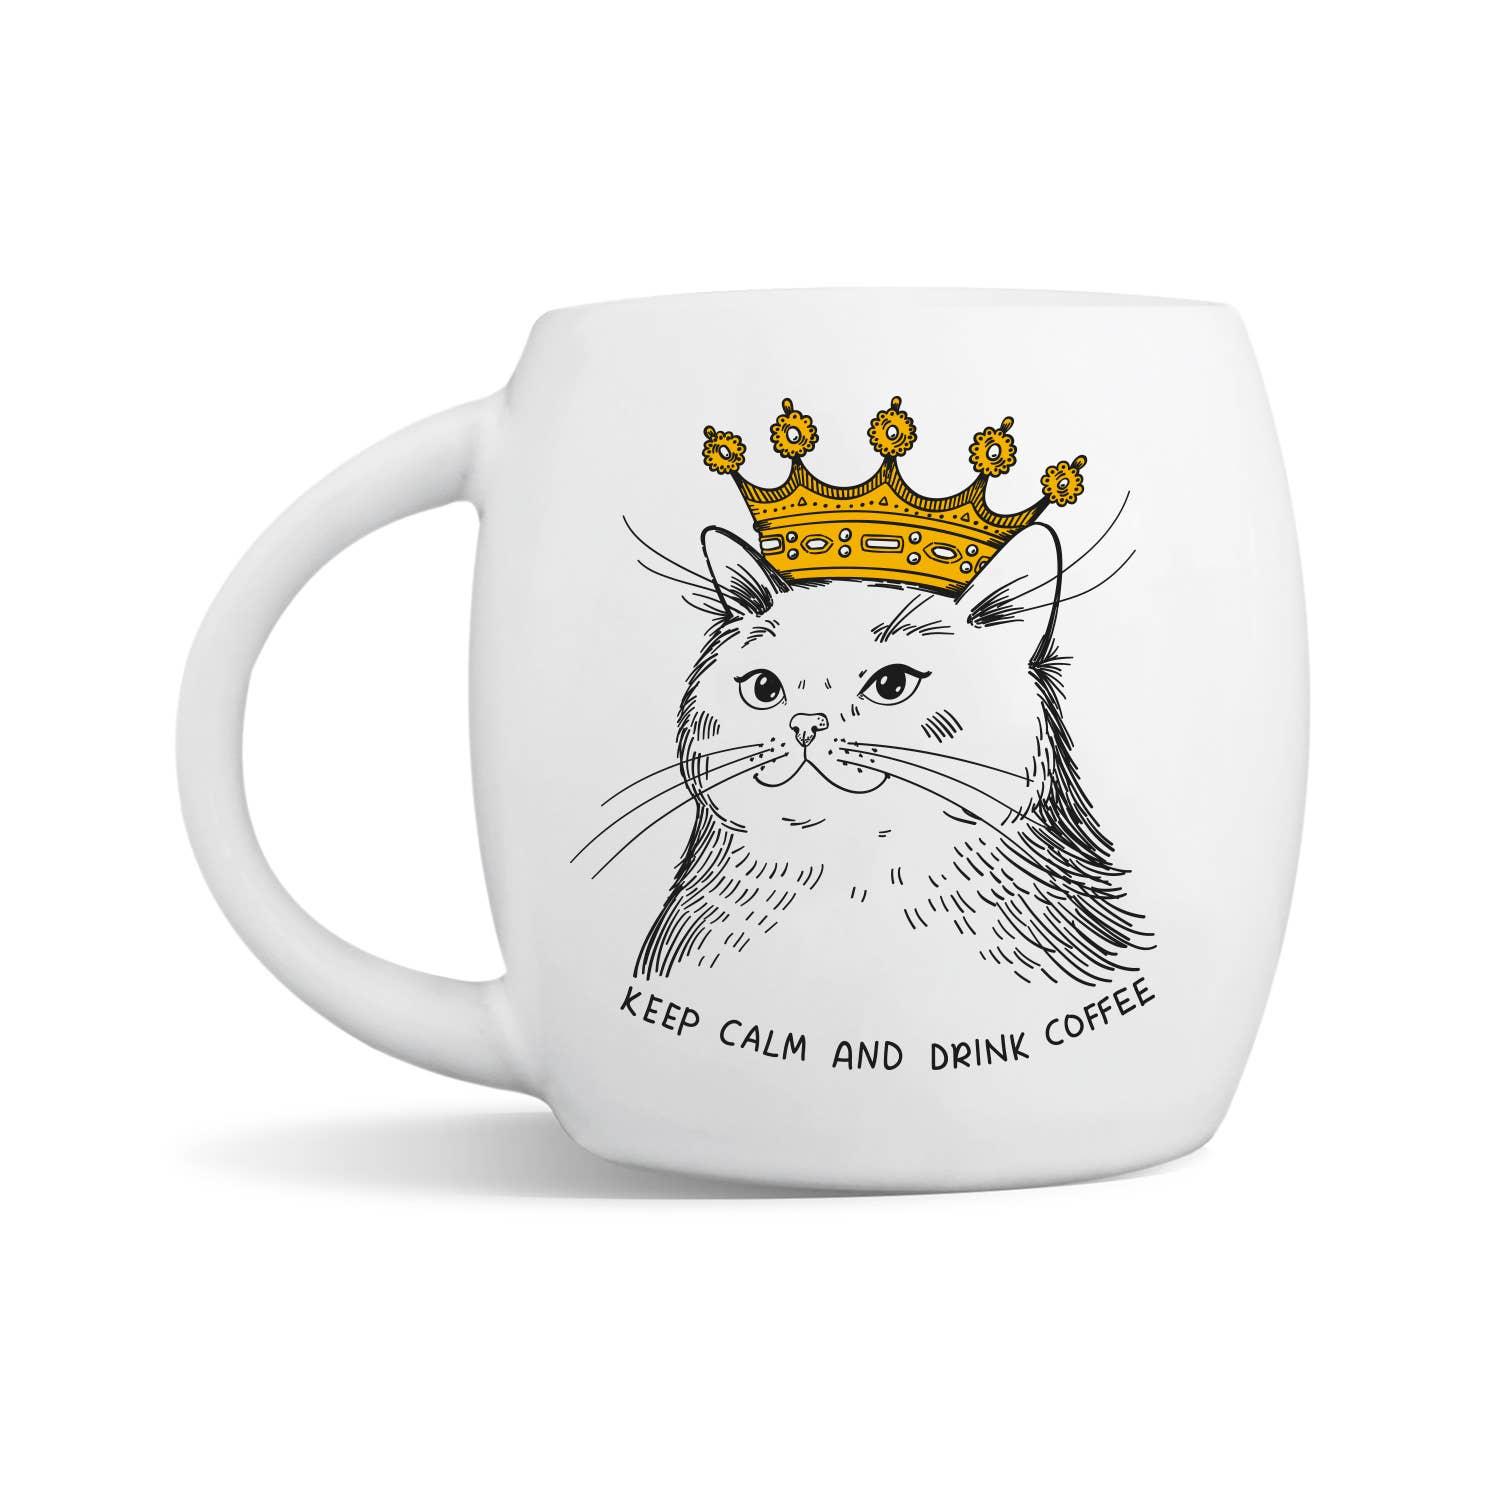 Her Serene Highness Mug | Trada Marketplace